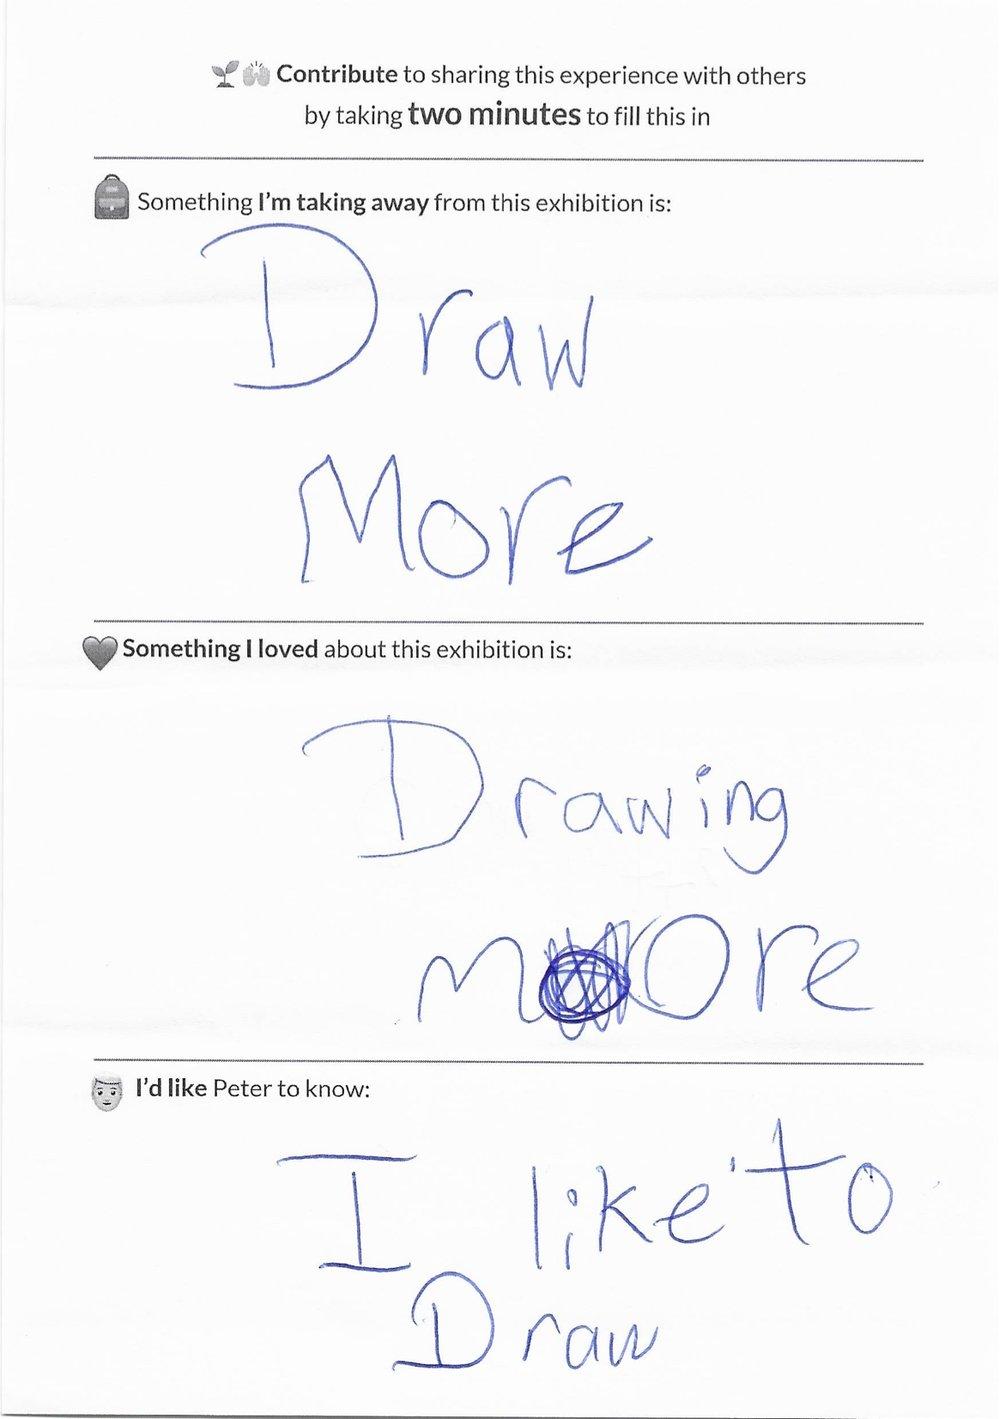 Drawn-in reflections-102.jpg